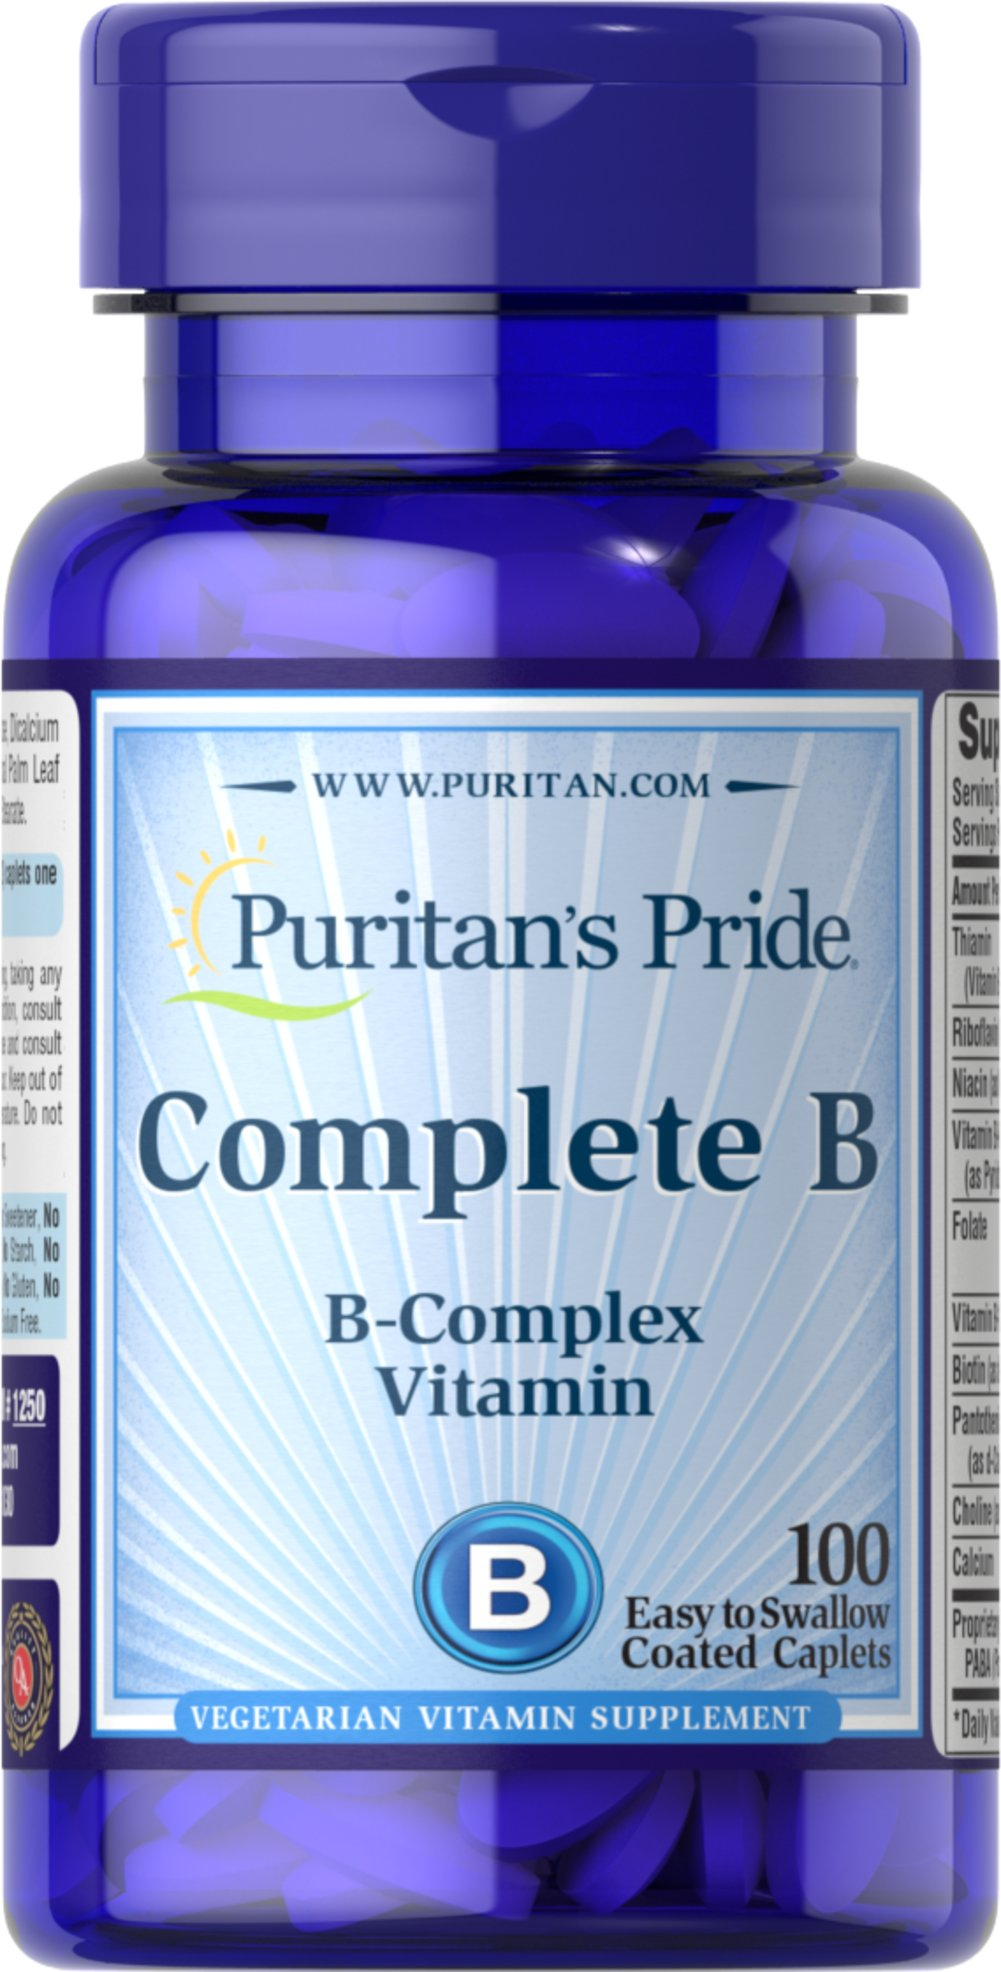 Complete B (Vitamin B Complex) 100 Caplets